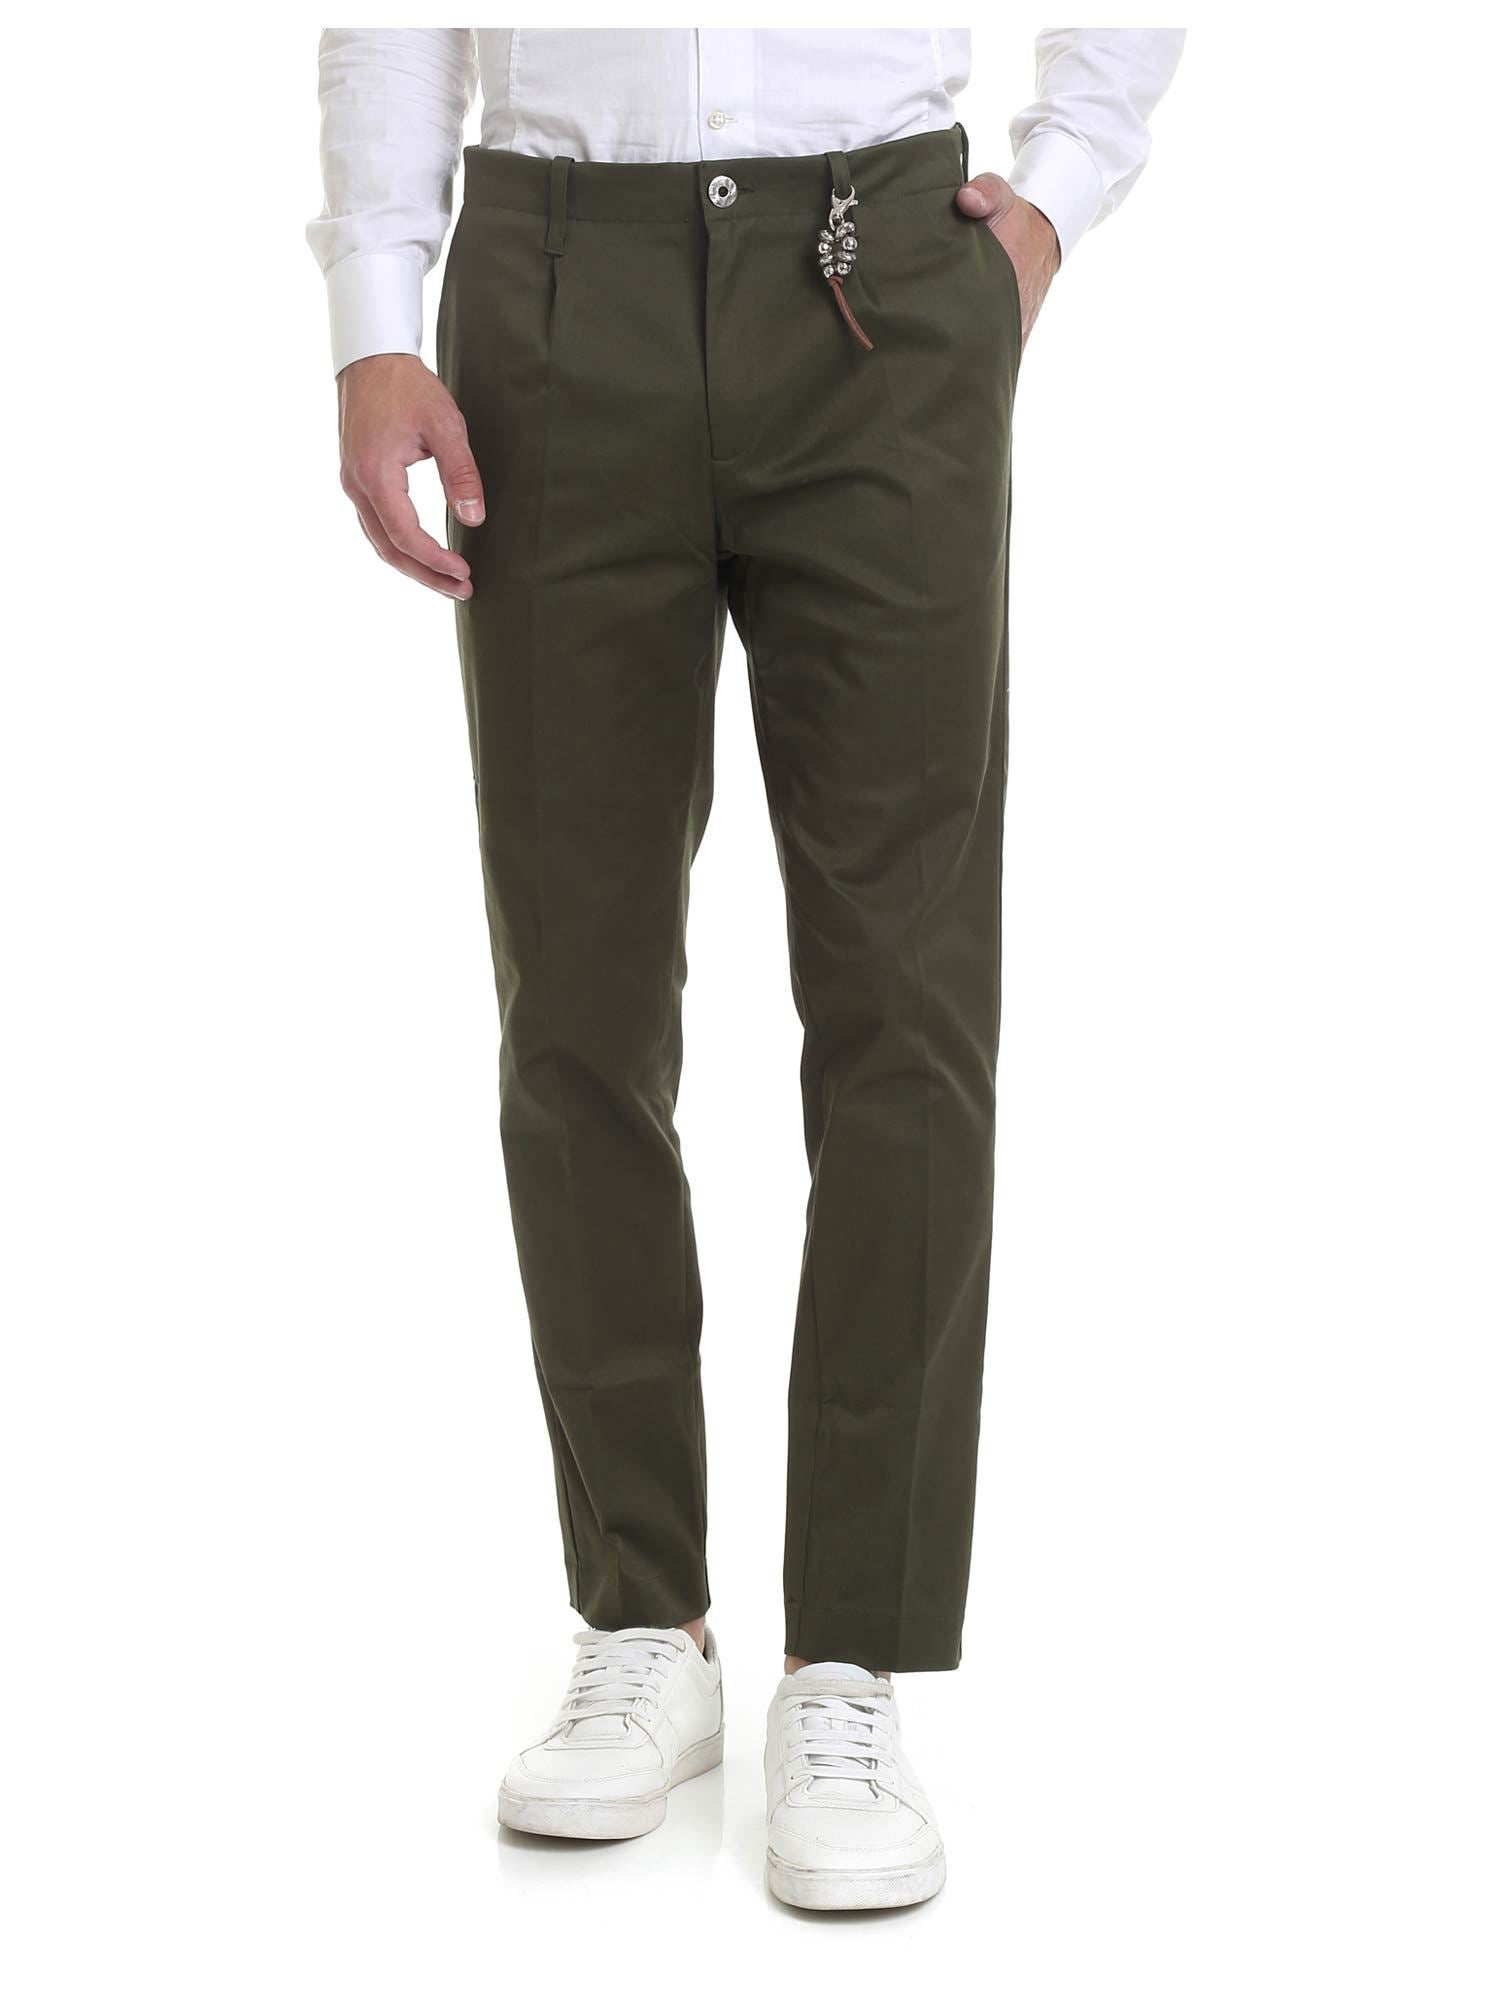 Image of Pantalone R92 verde